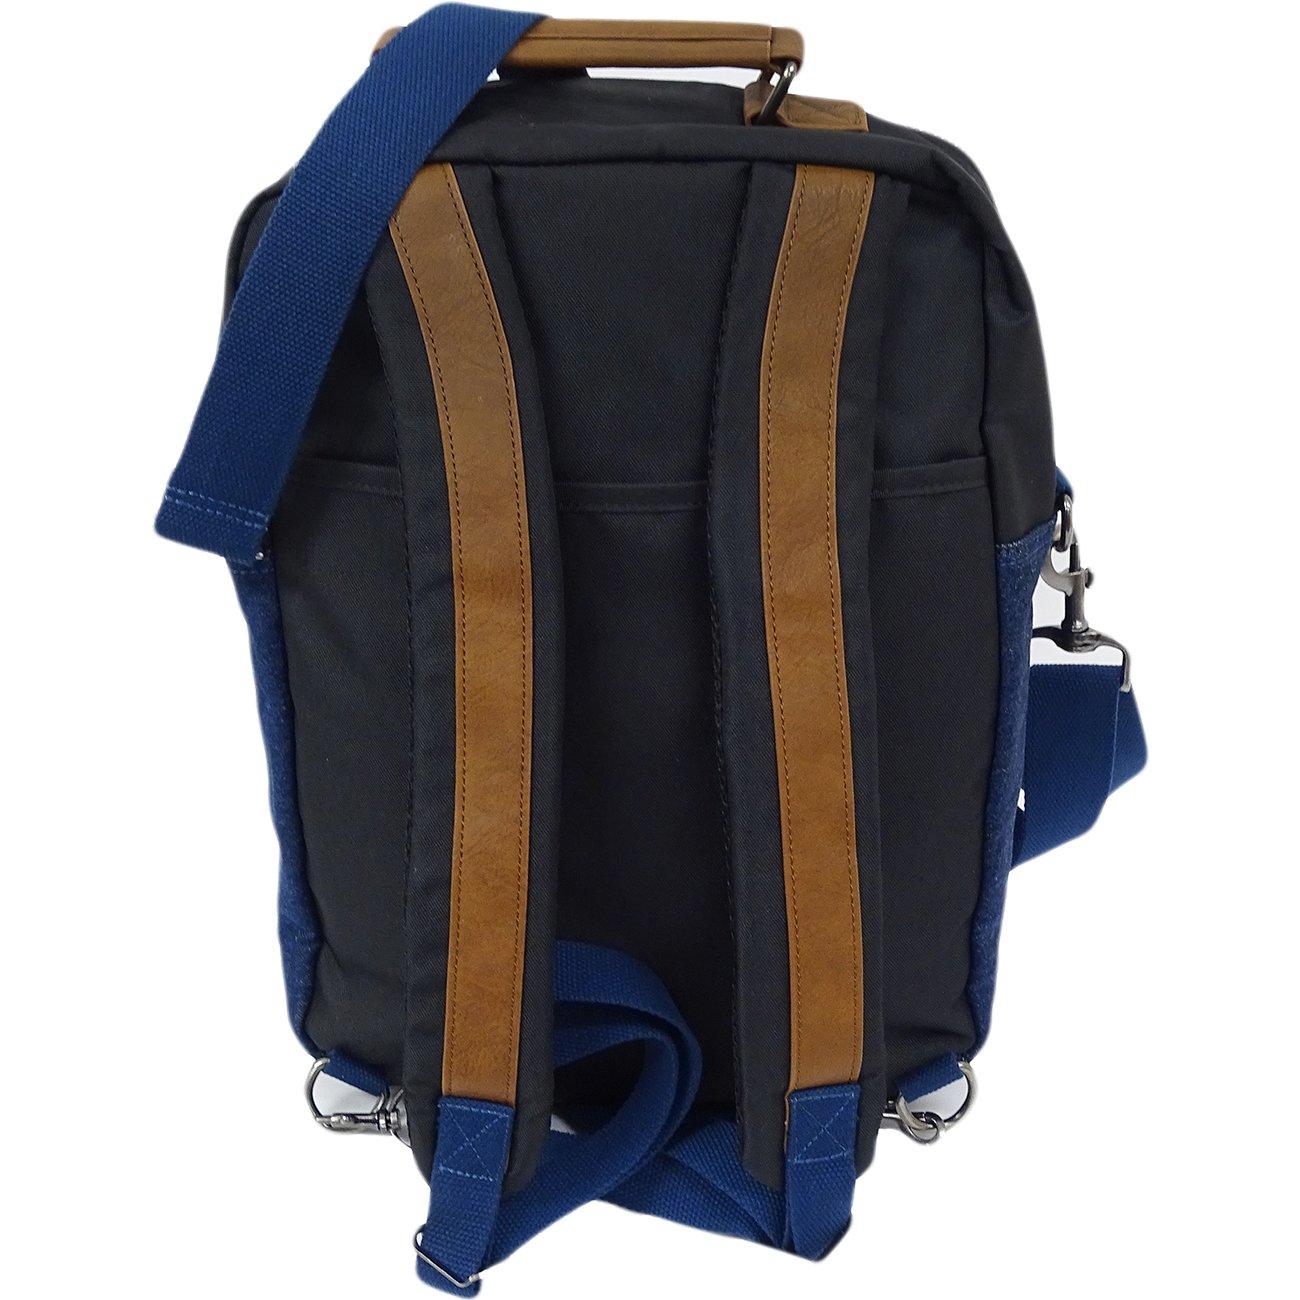 9d4033f163b3 Mens Bags Original Penguin Rucksack Bag - School   Work   Gym Holdall  BackPack Chambray Dark Sapphire  Amazon.co.uk  Clothing